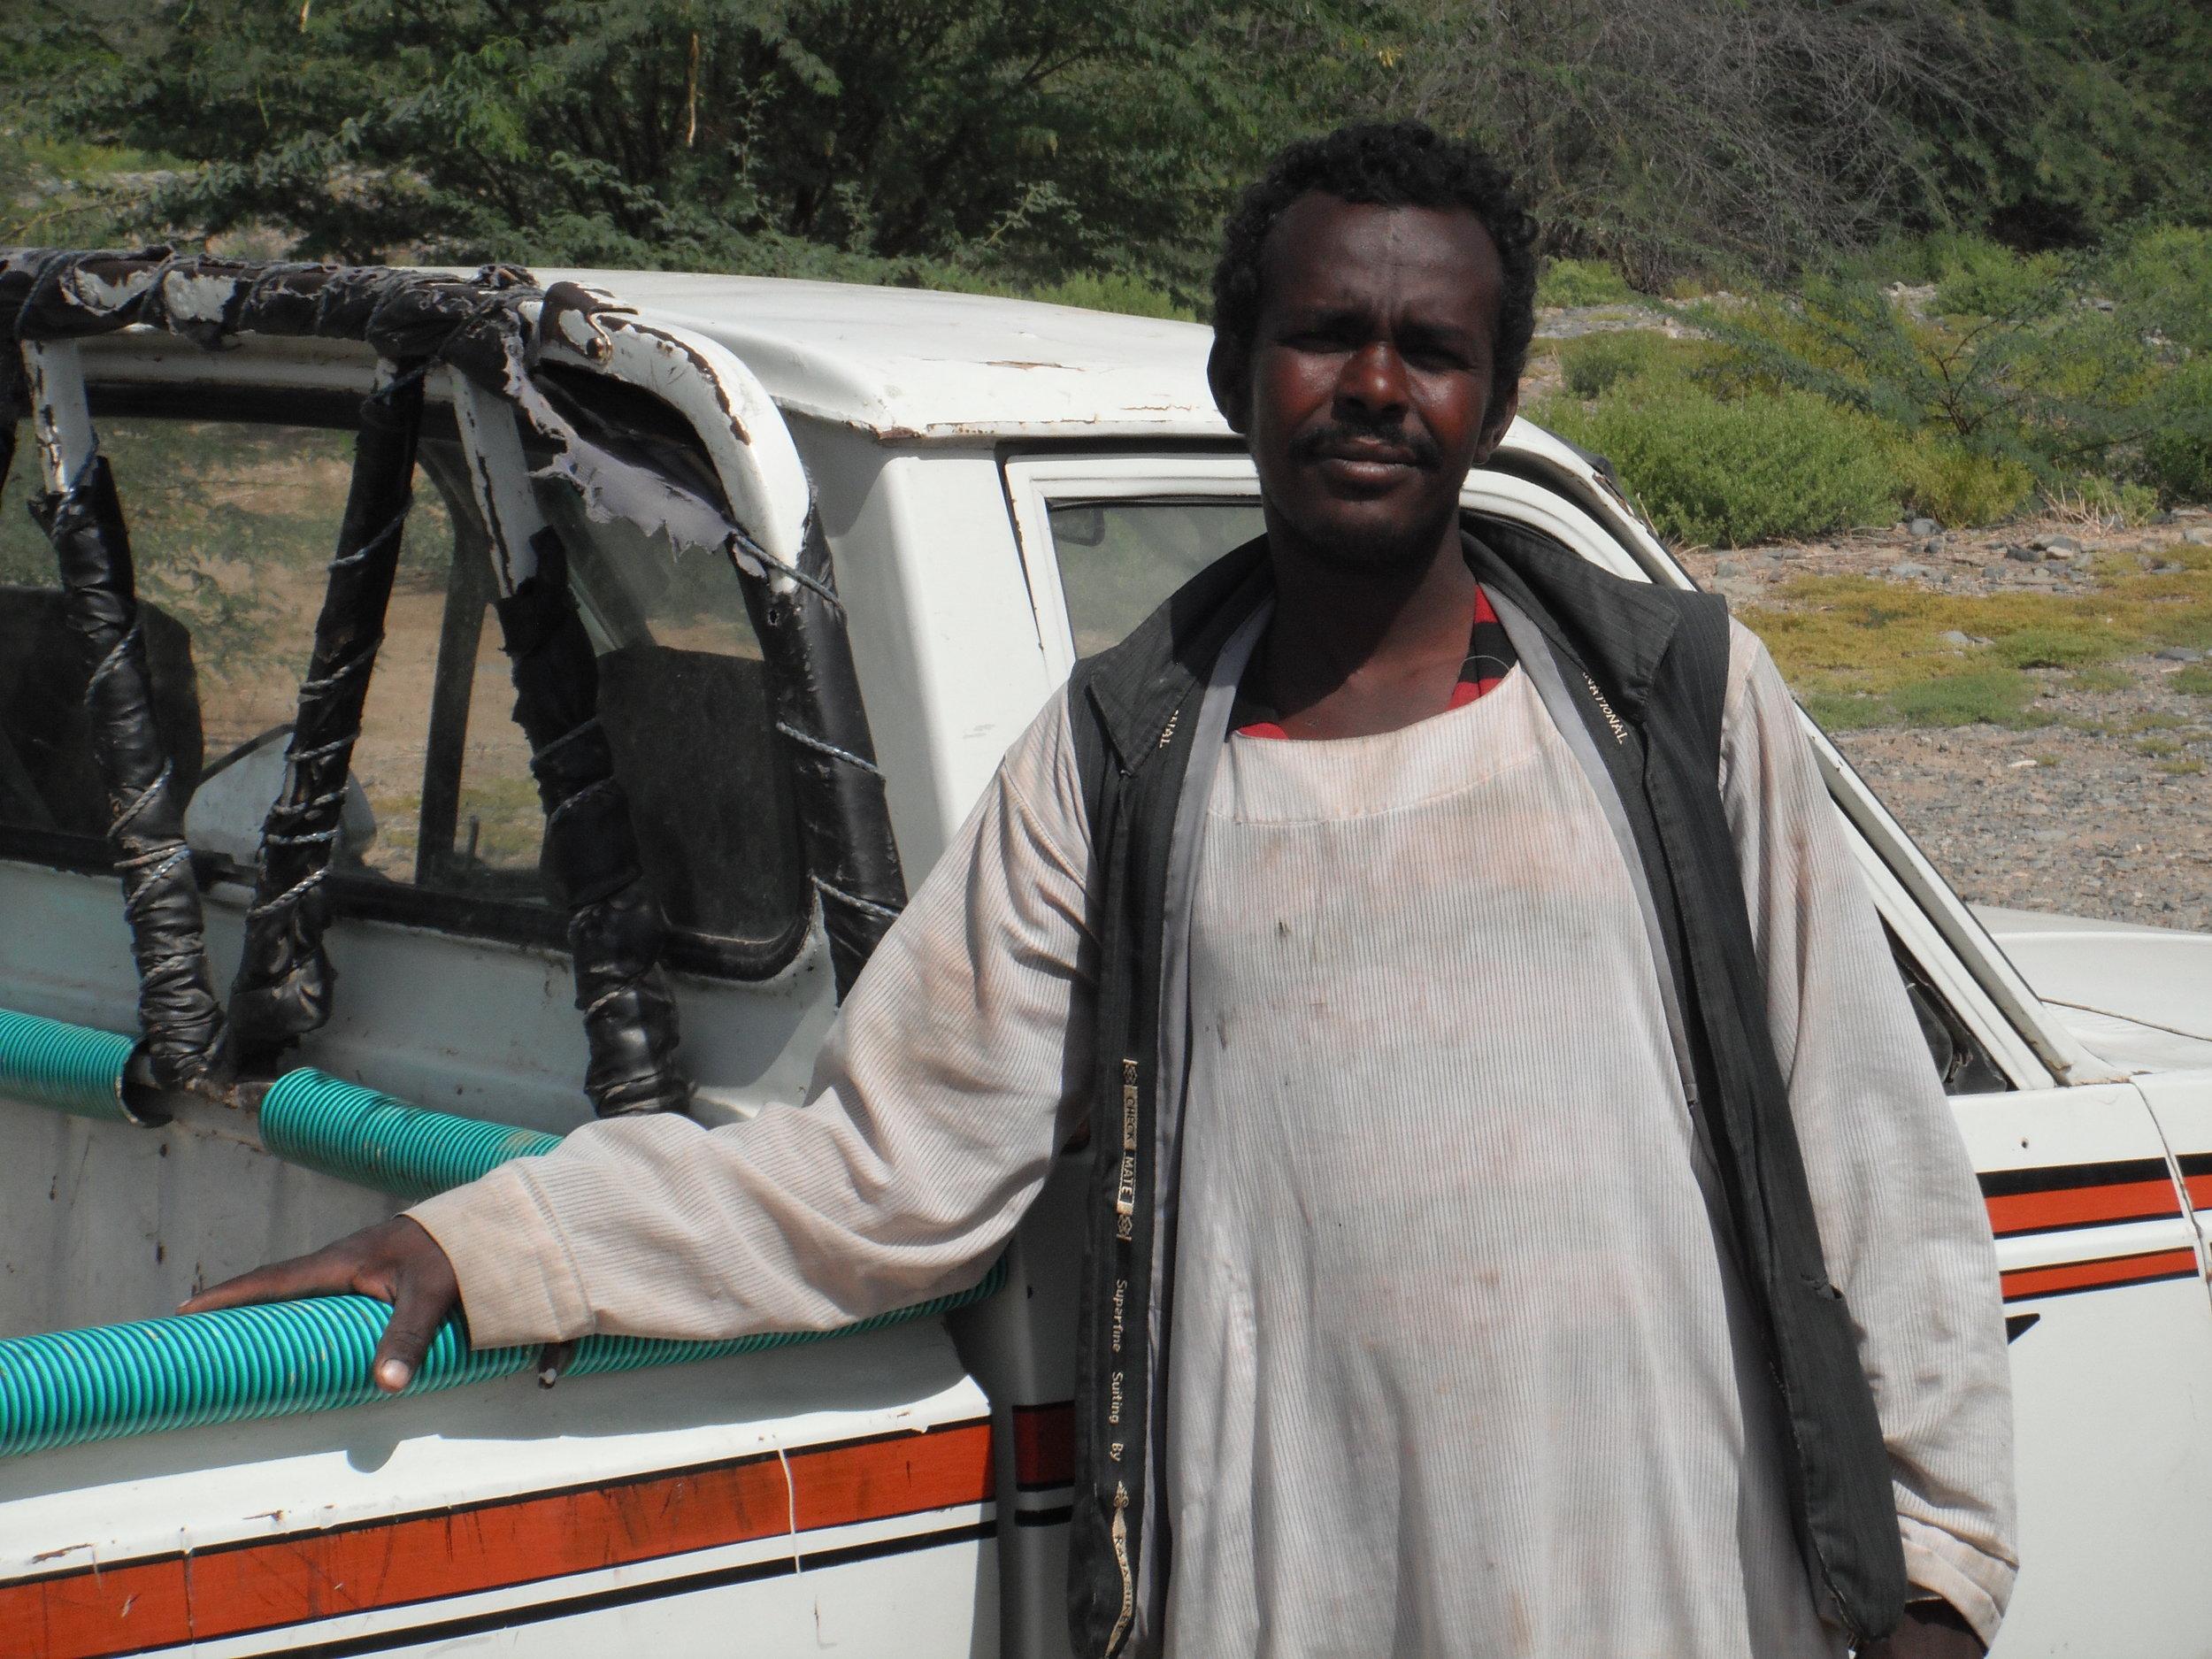 Horticulturalist 36 years old SOS Sahel Bilaib village, Gunub & Awlieb, Red Sea State